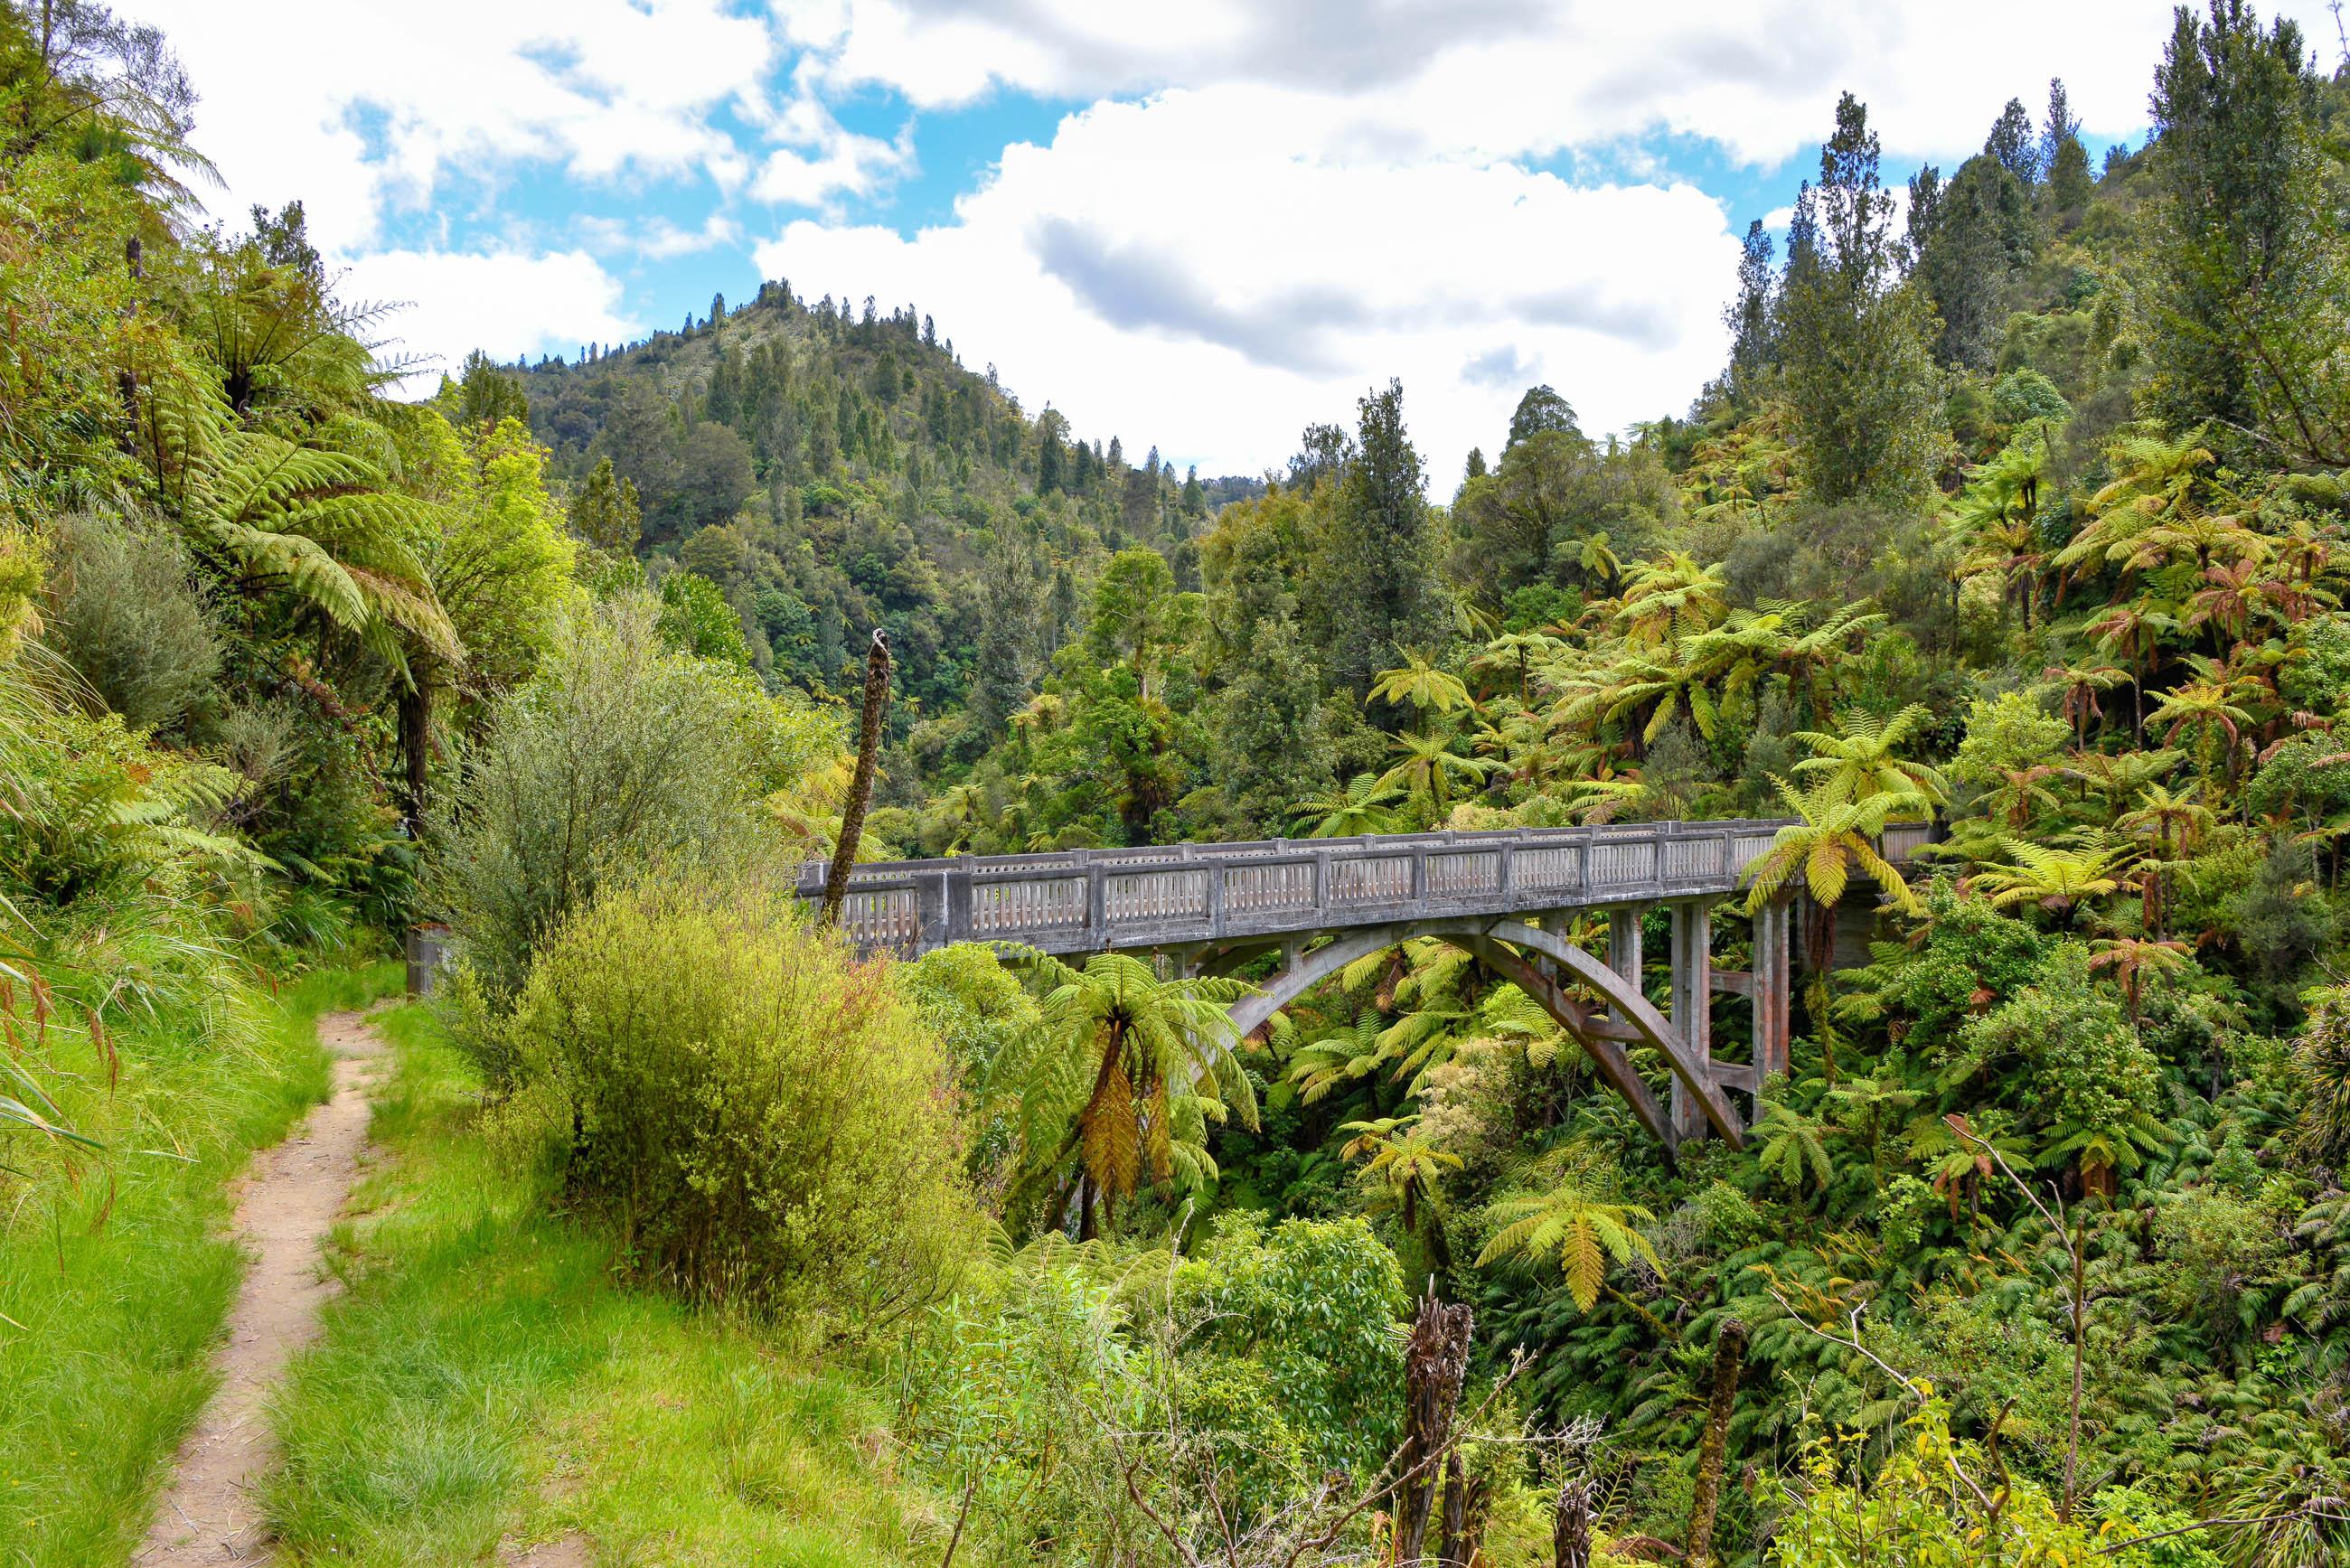 30 Bridge to Nowhere im Whanganui Nationalpark, Neuseeland   Franks ...